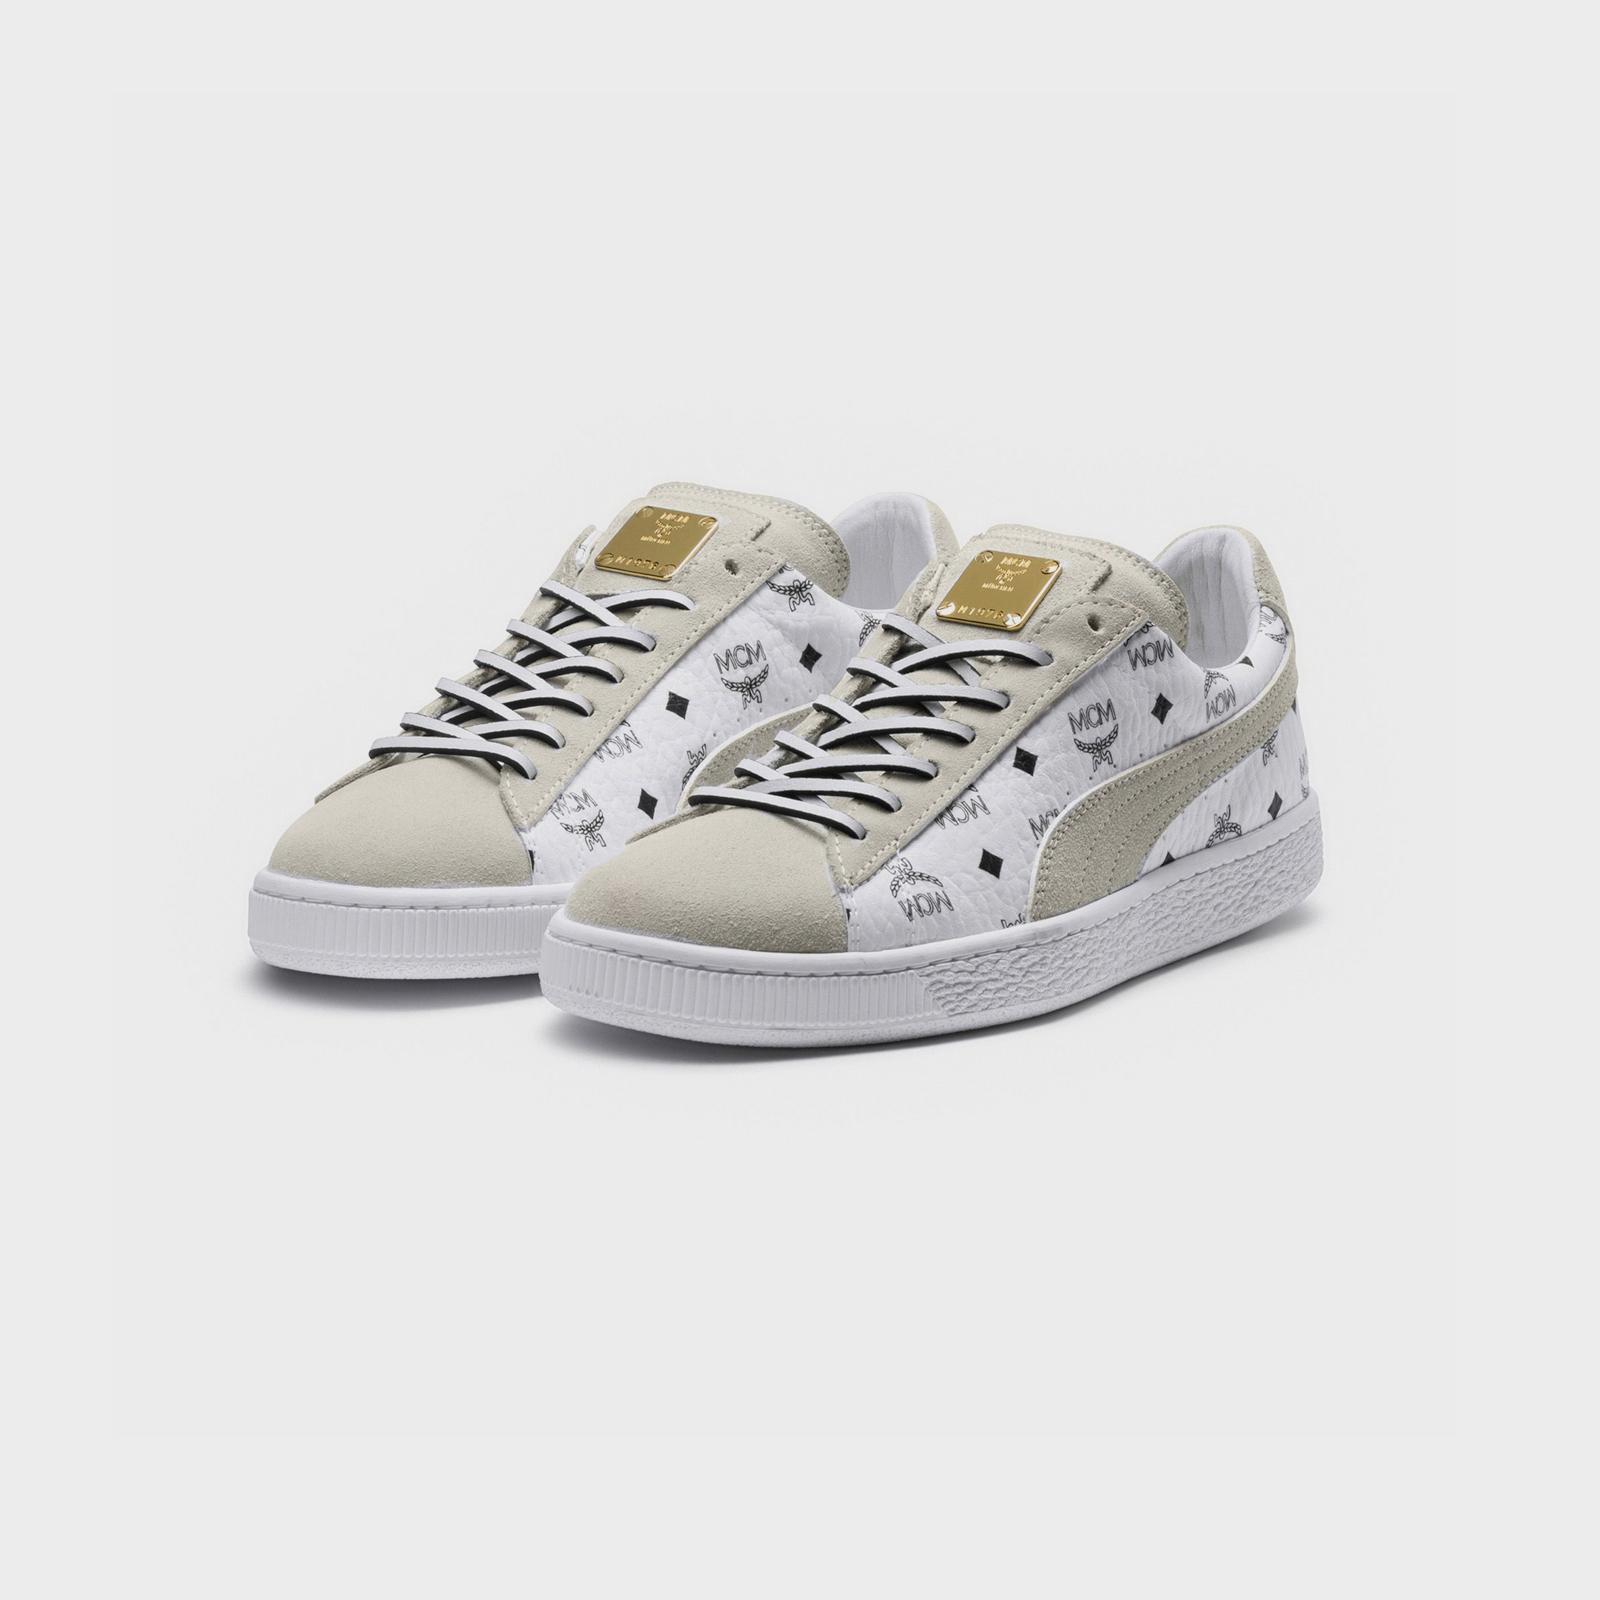 048cb43d7bb054 Puma Suede Classic x MCM - 366299-02 - Sneakersnstuff